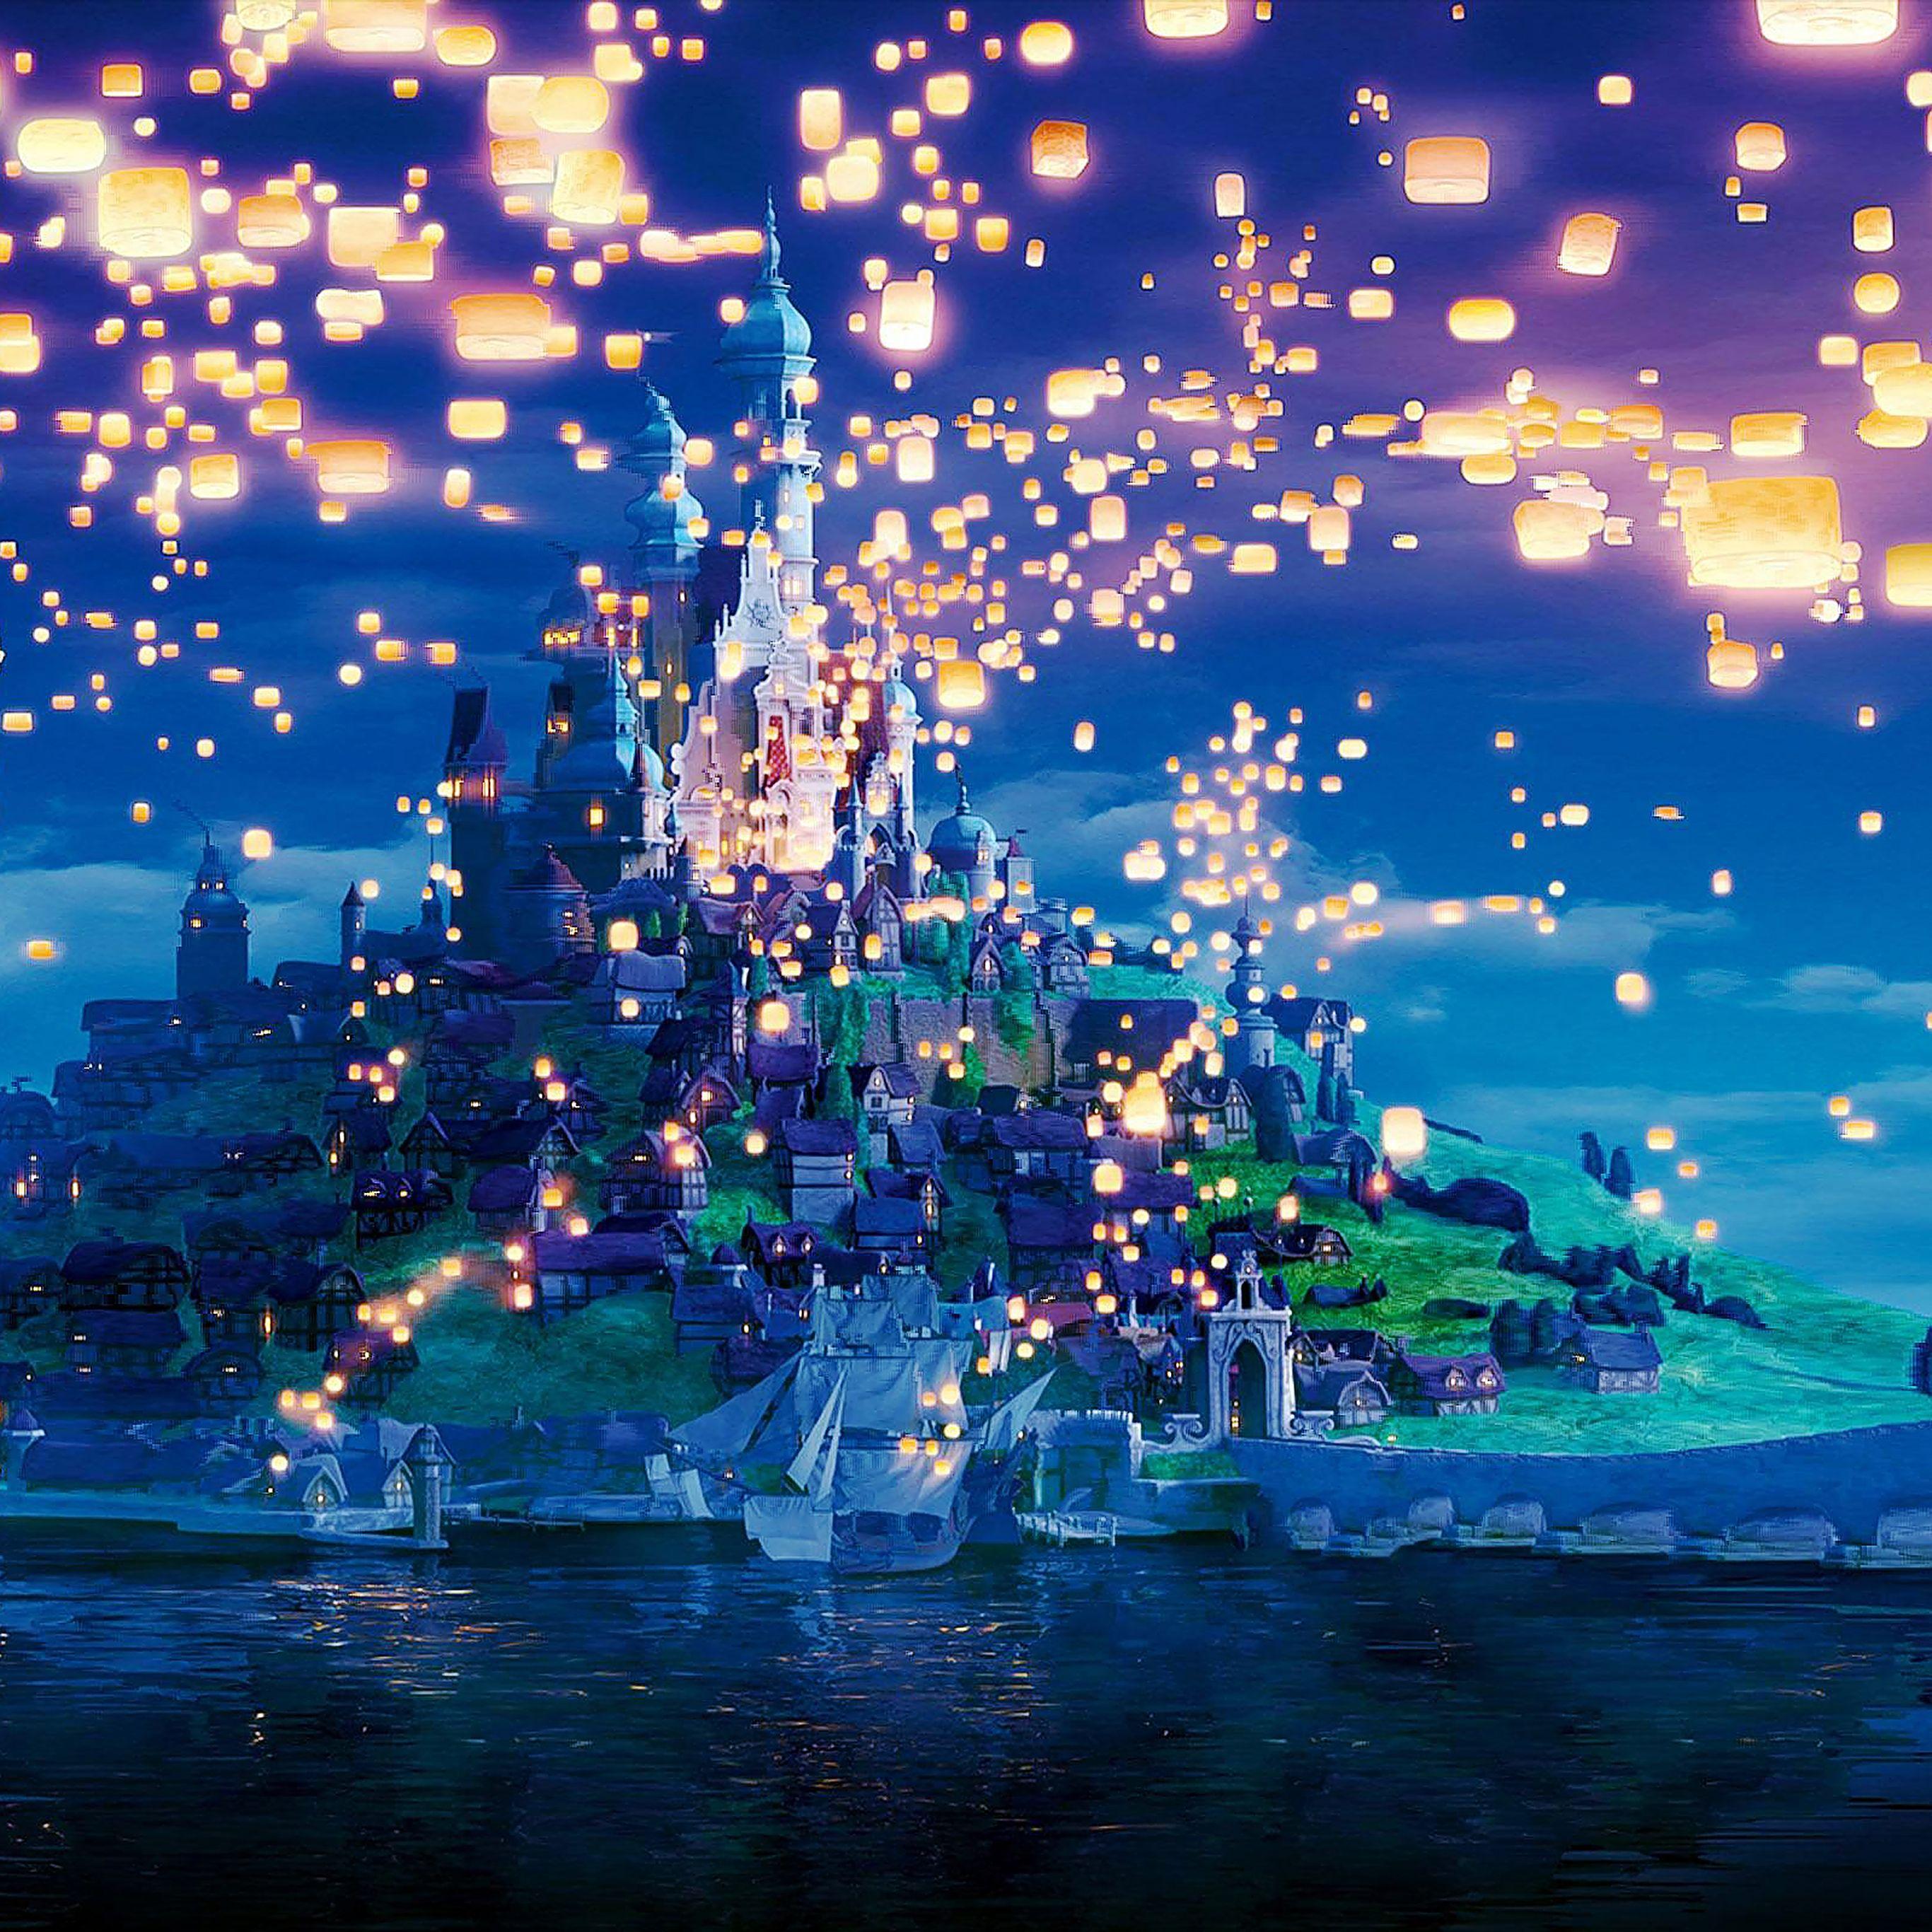 Disney Ipad Wallpapers Top Free Disney Ipad Backgrounds Wallpaperaccess